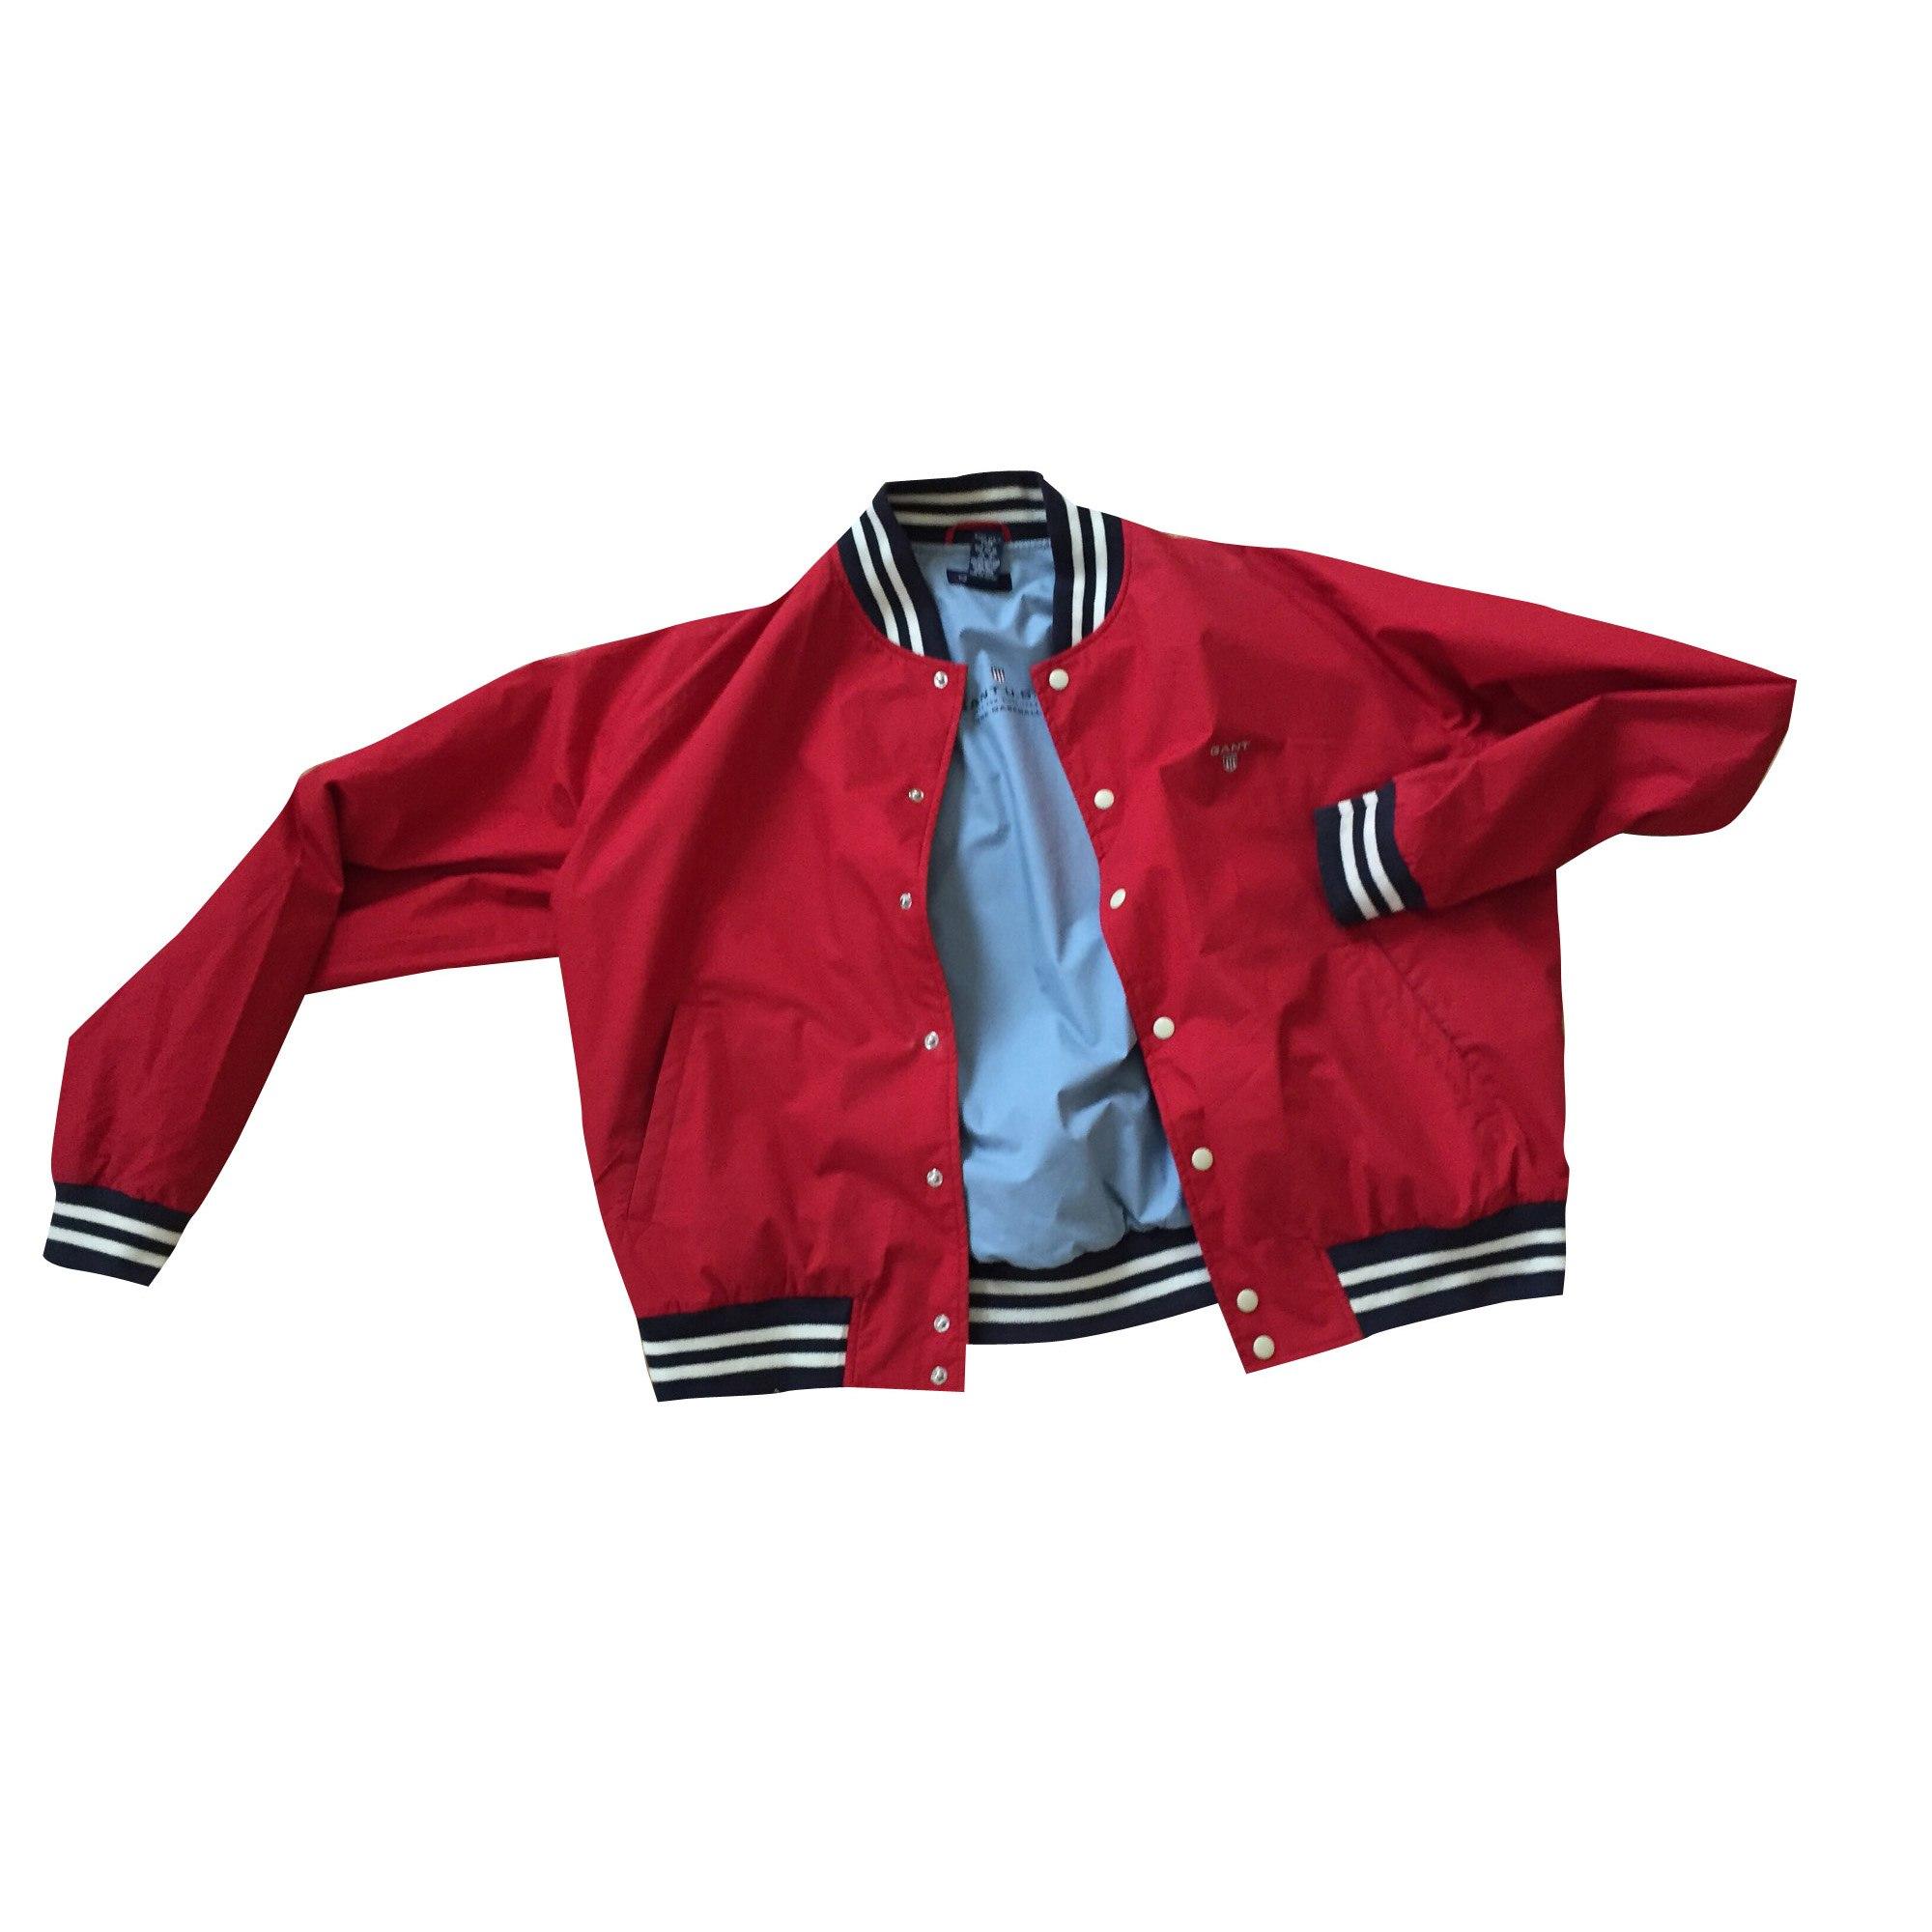 Zipped Jacket GANT Red, burgundy